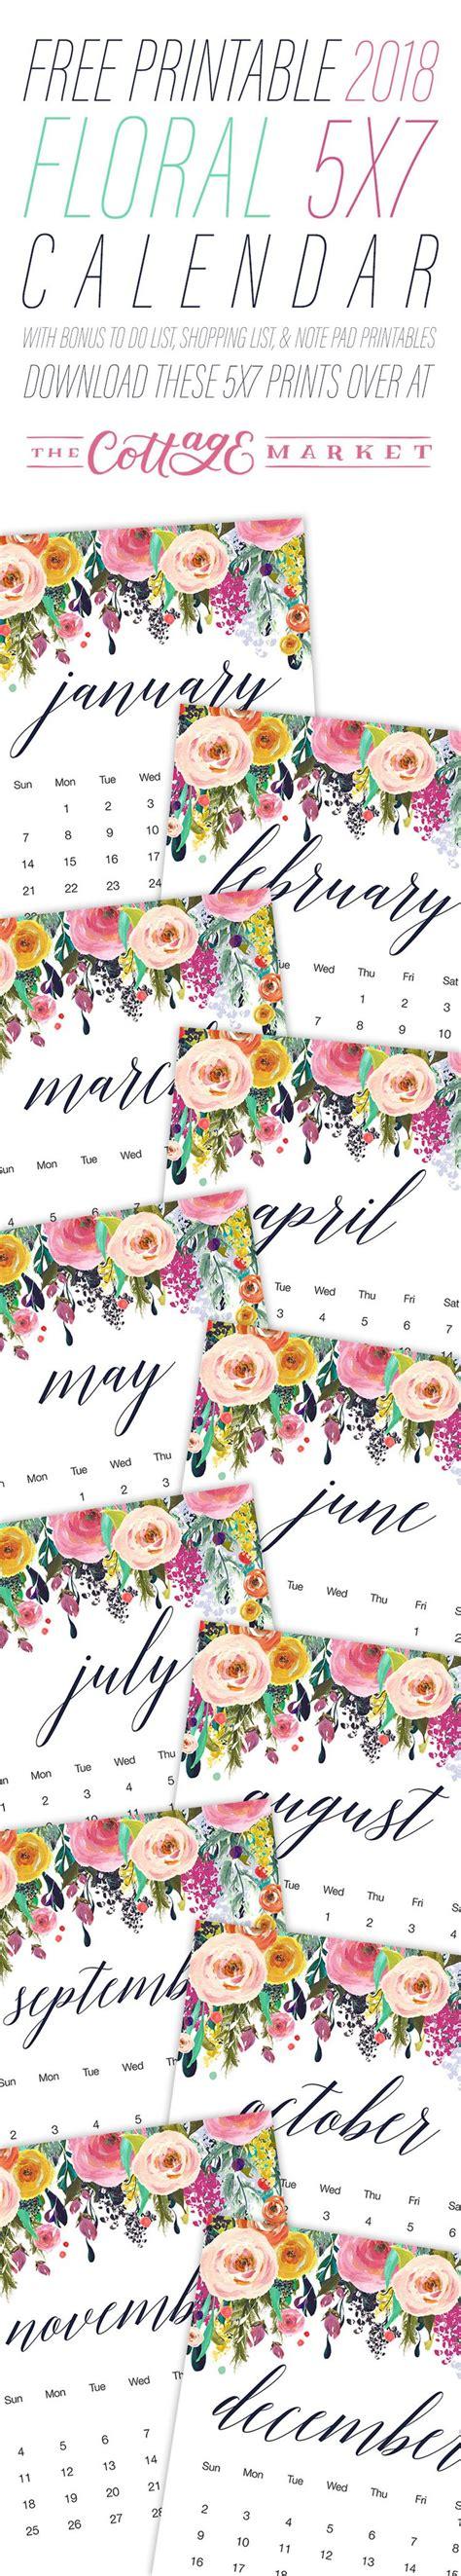 printable calendars ideas pinterest